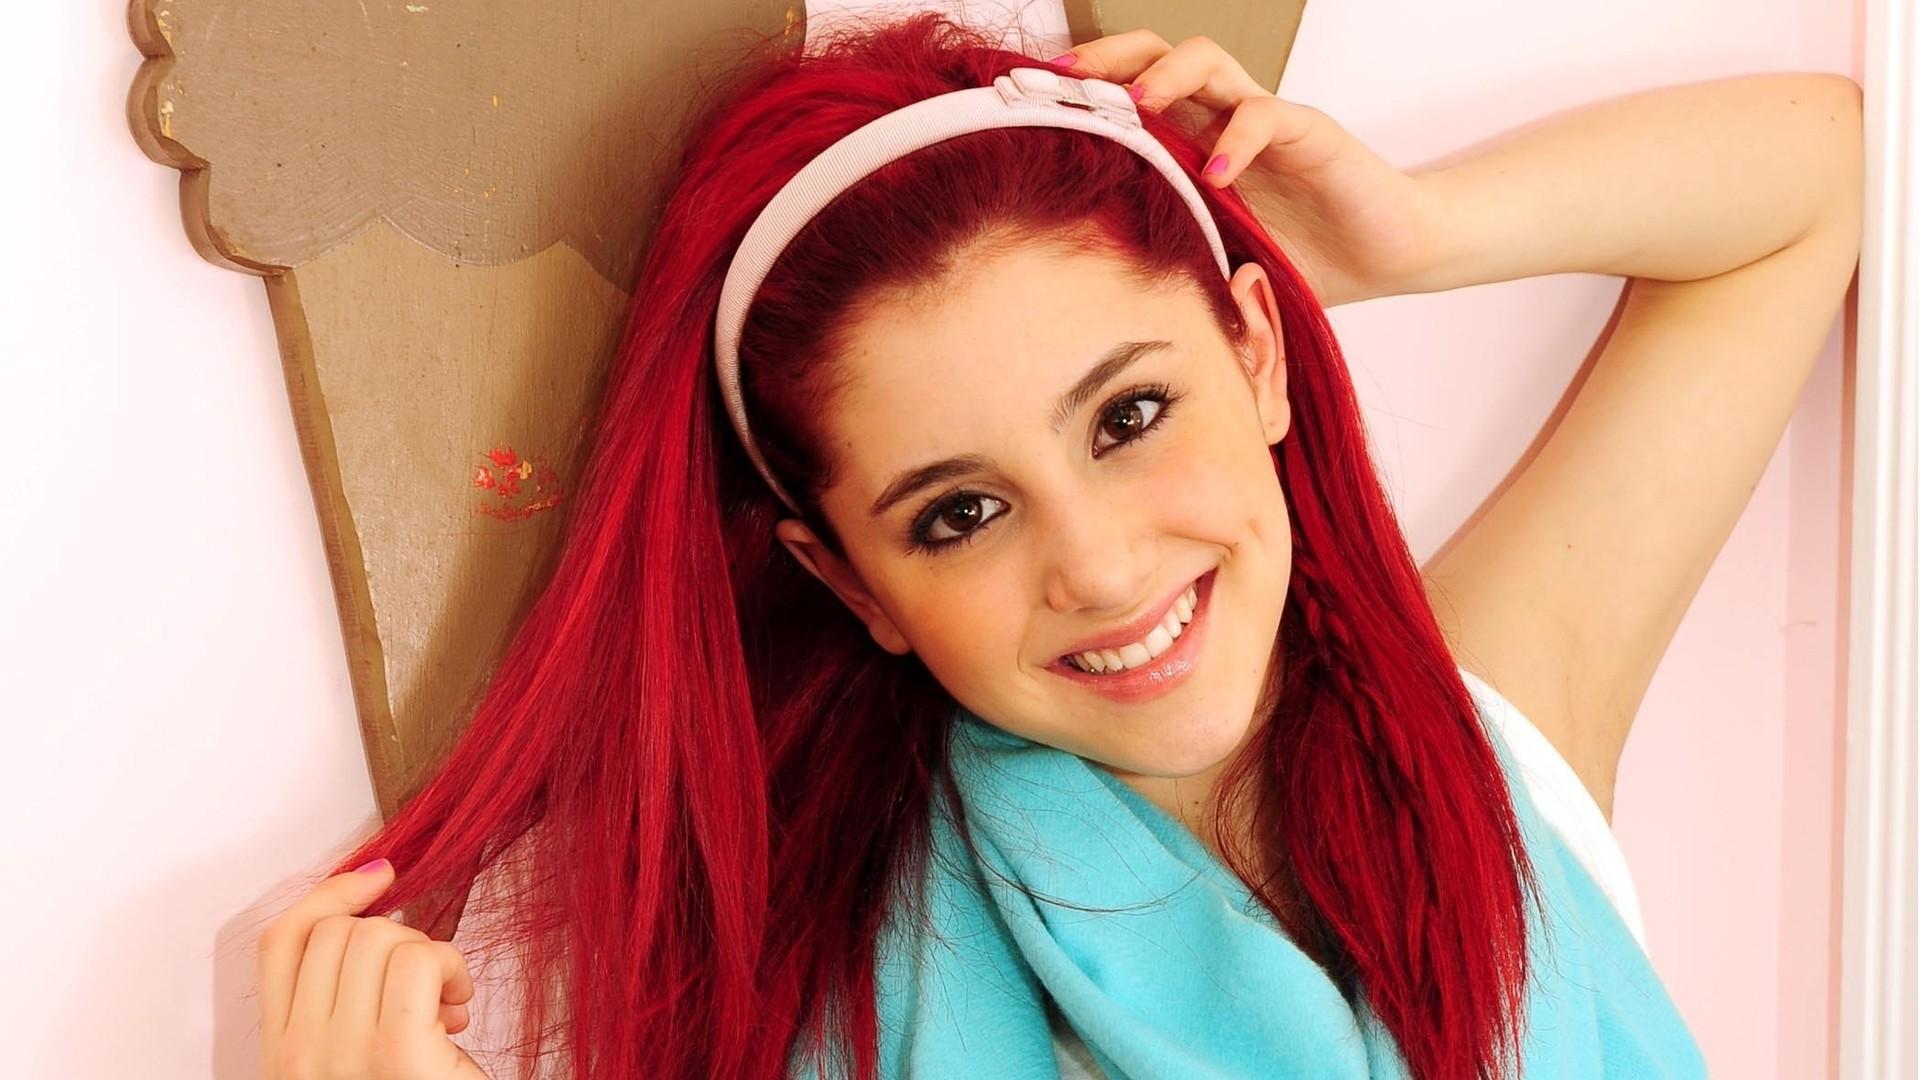 Ariana Grande 2013 Wallpaper